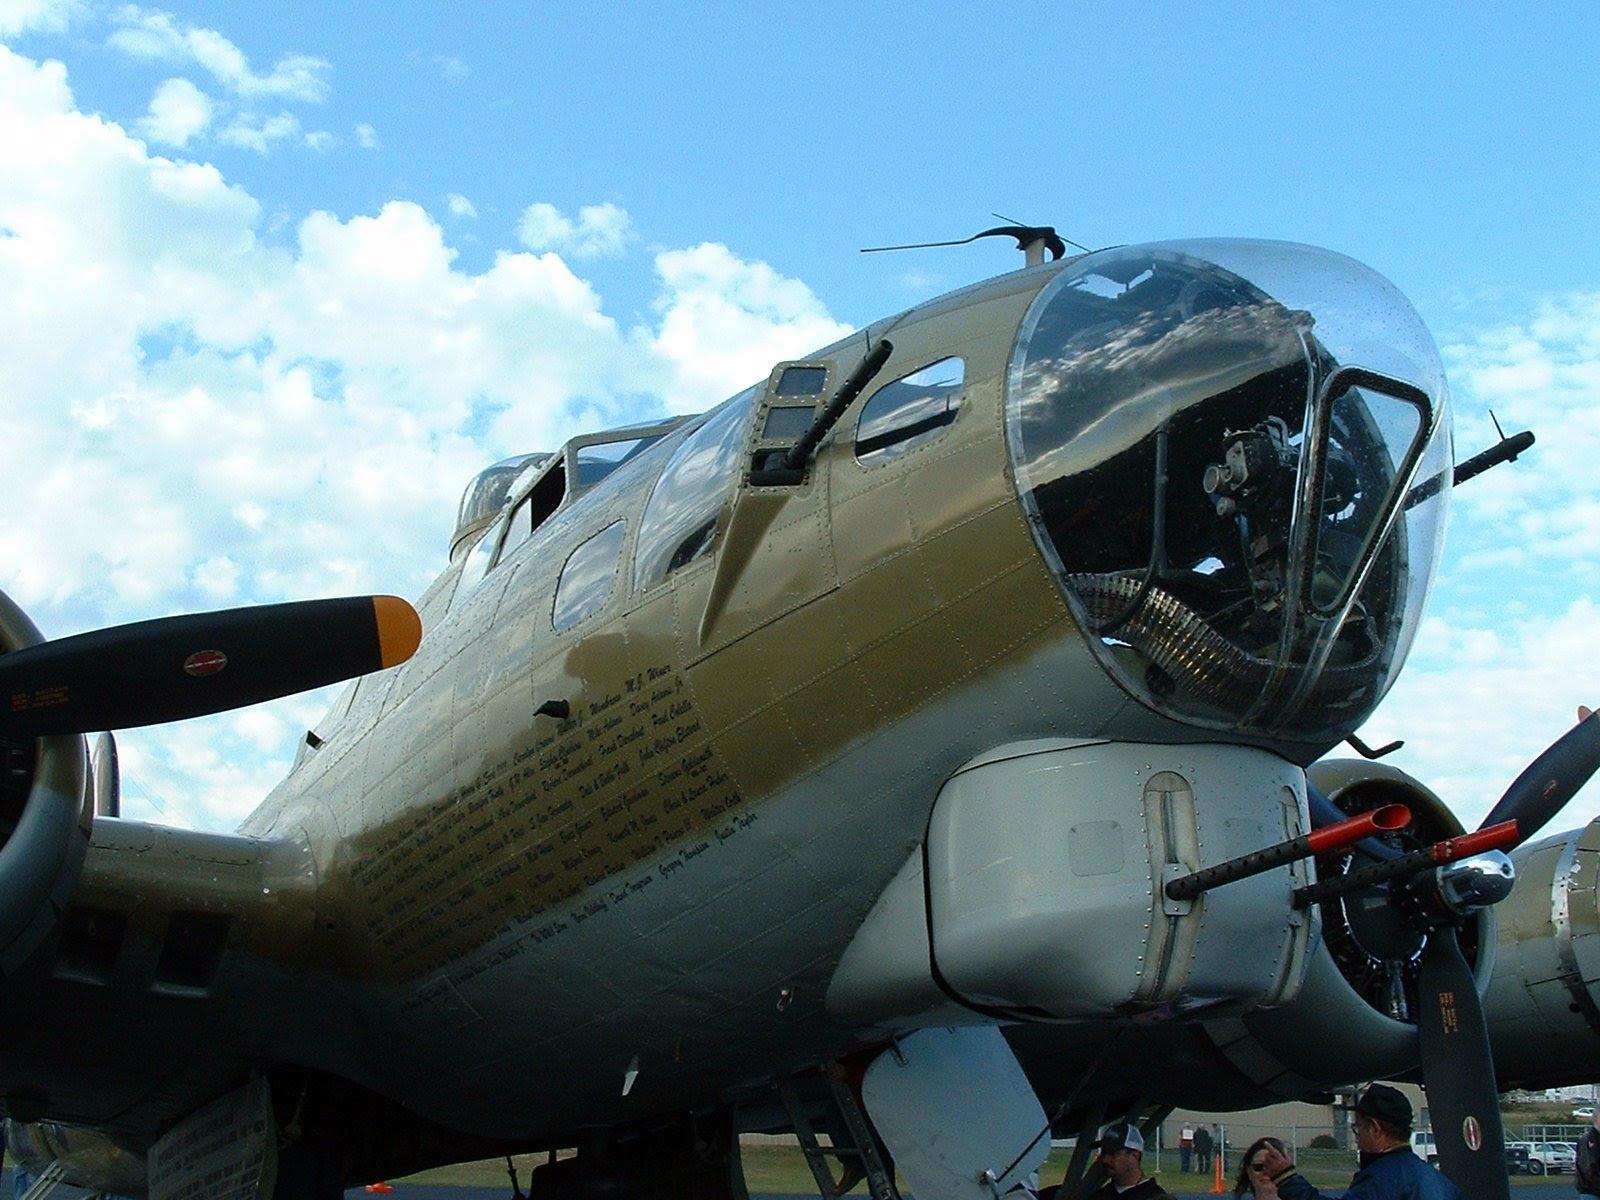 B17 Bomber Wallpaper 1600x1200 34184